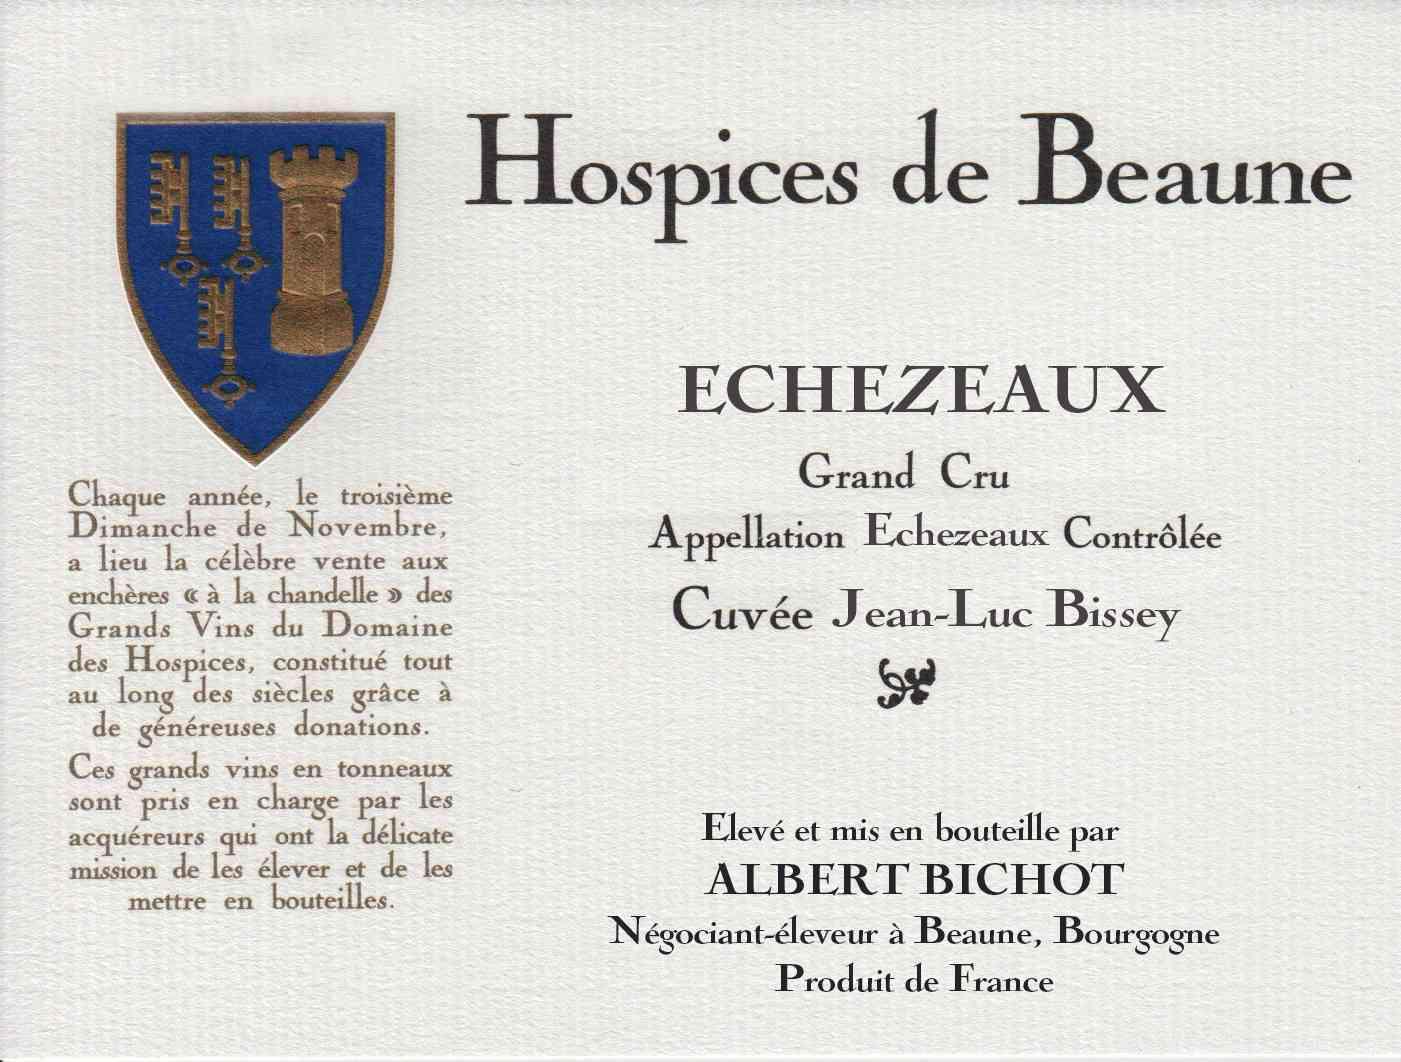 Encheres-auction-HospicesdeBeaune-AlbertBichot-EchezeauxGrandCru-Cuvee-JeanLucBissey